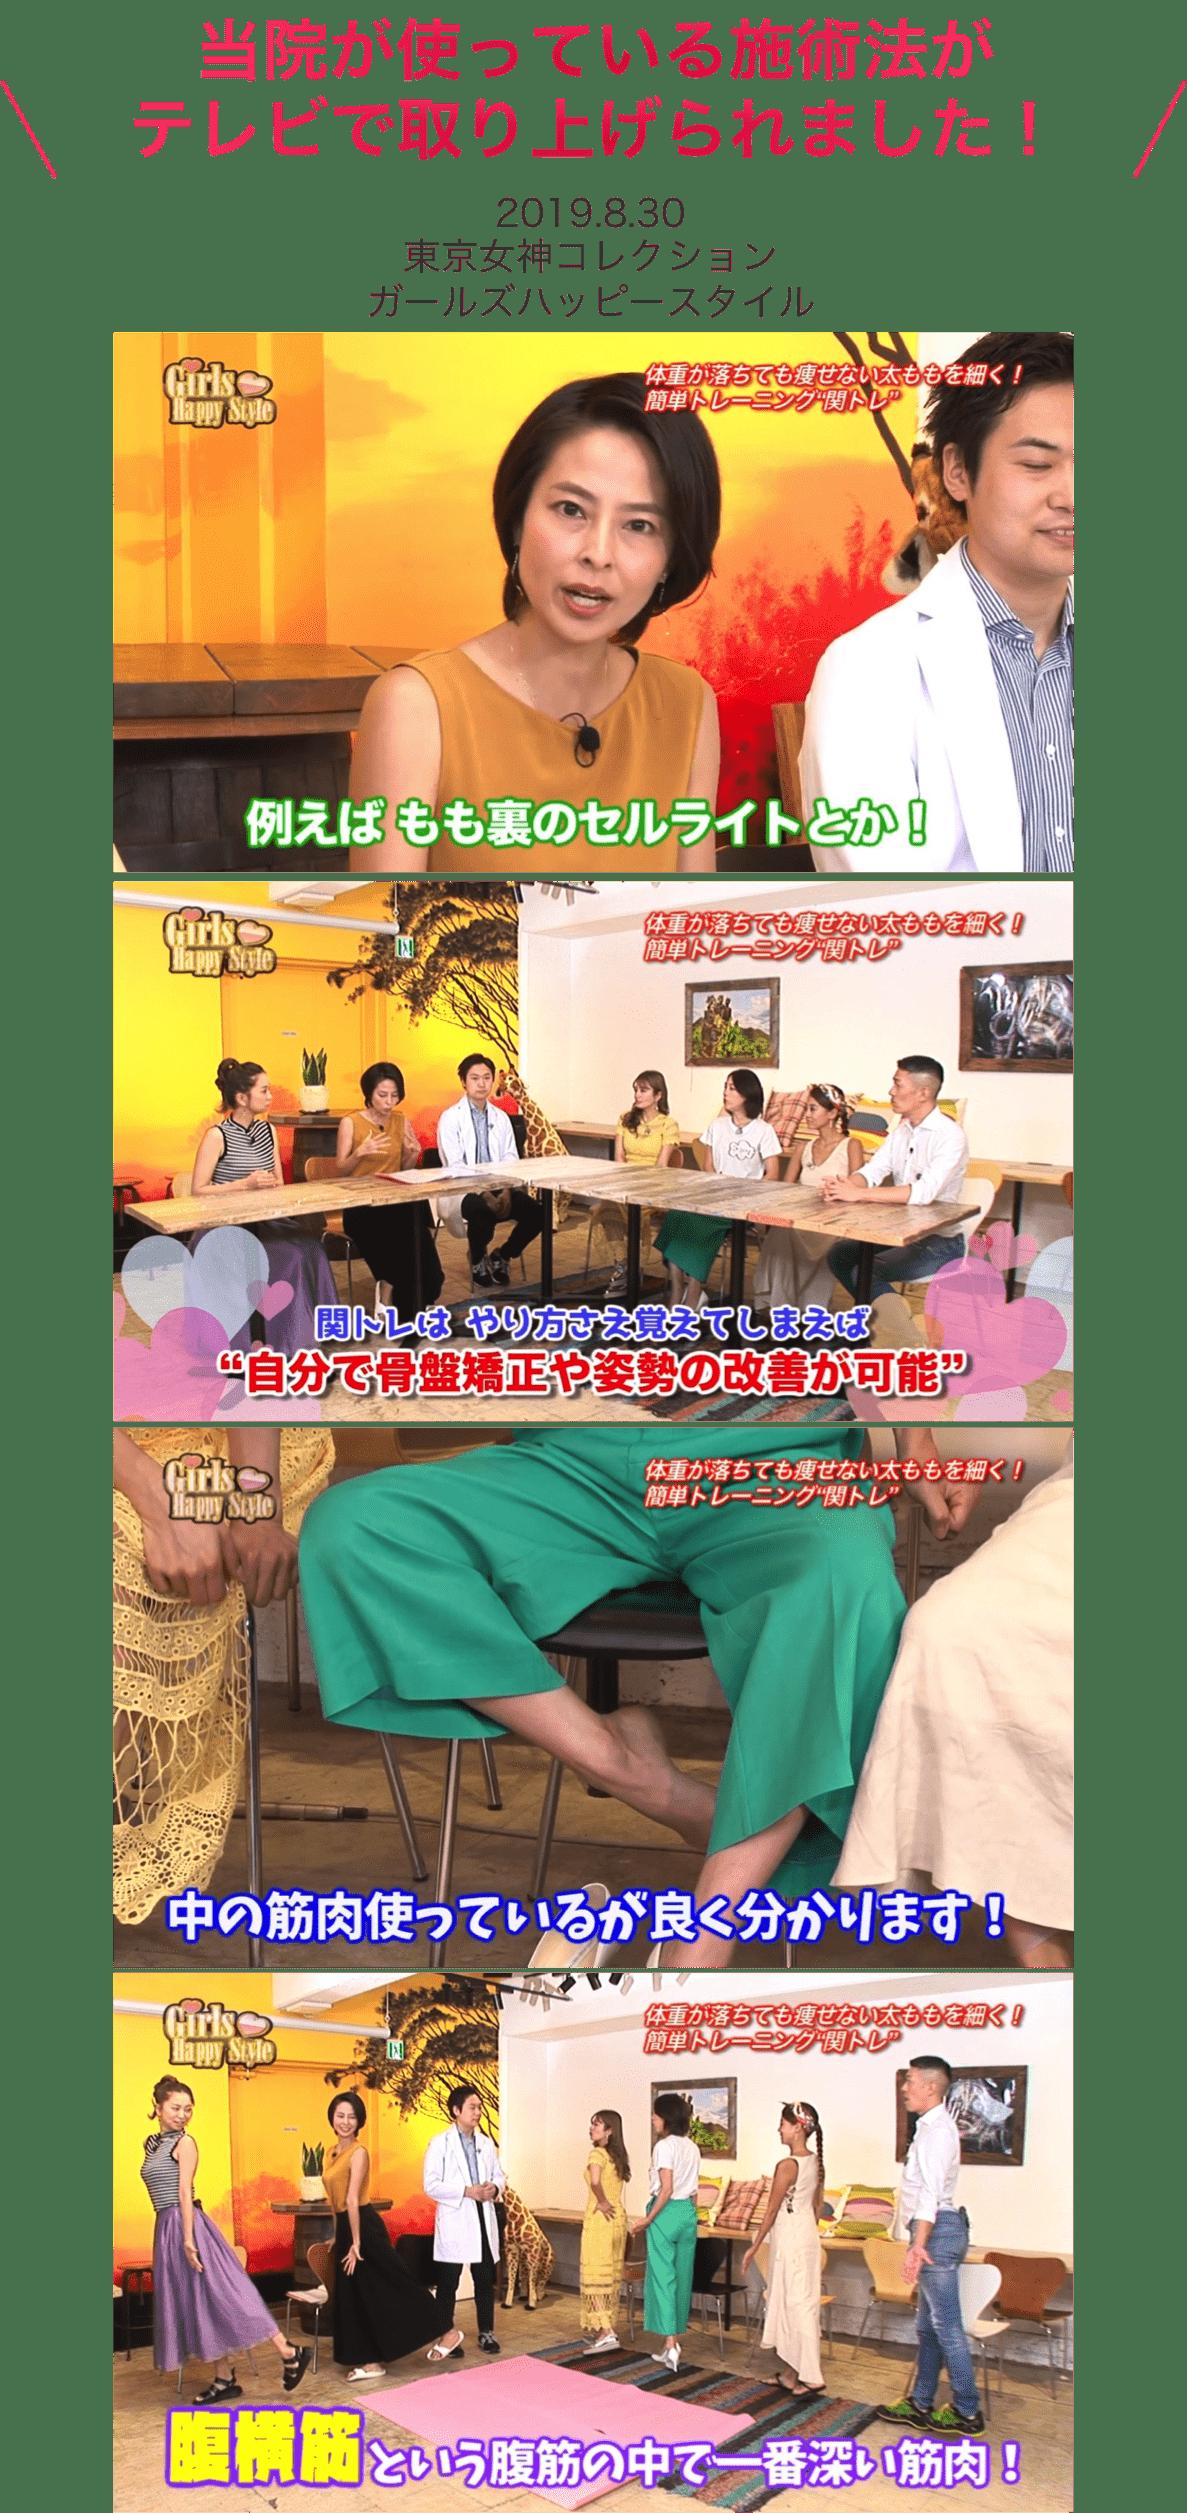 上田市 産後 骨盤矯正 テレビ実績 芸能人が体験